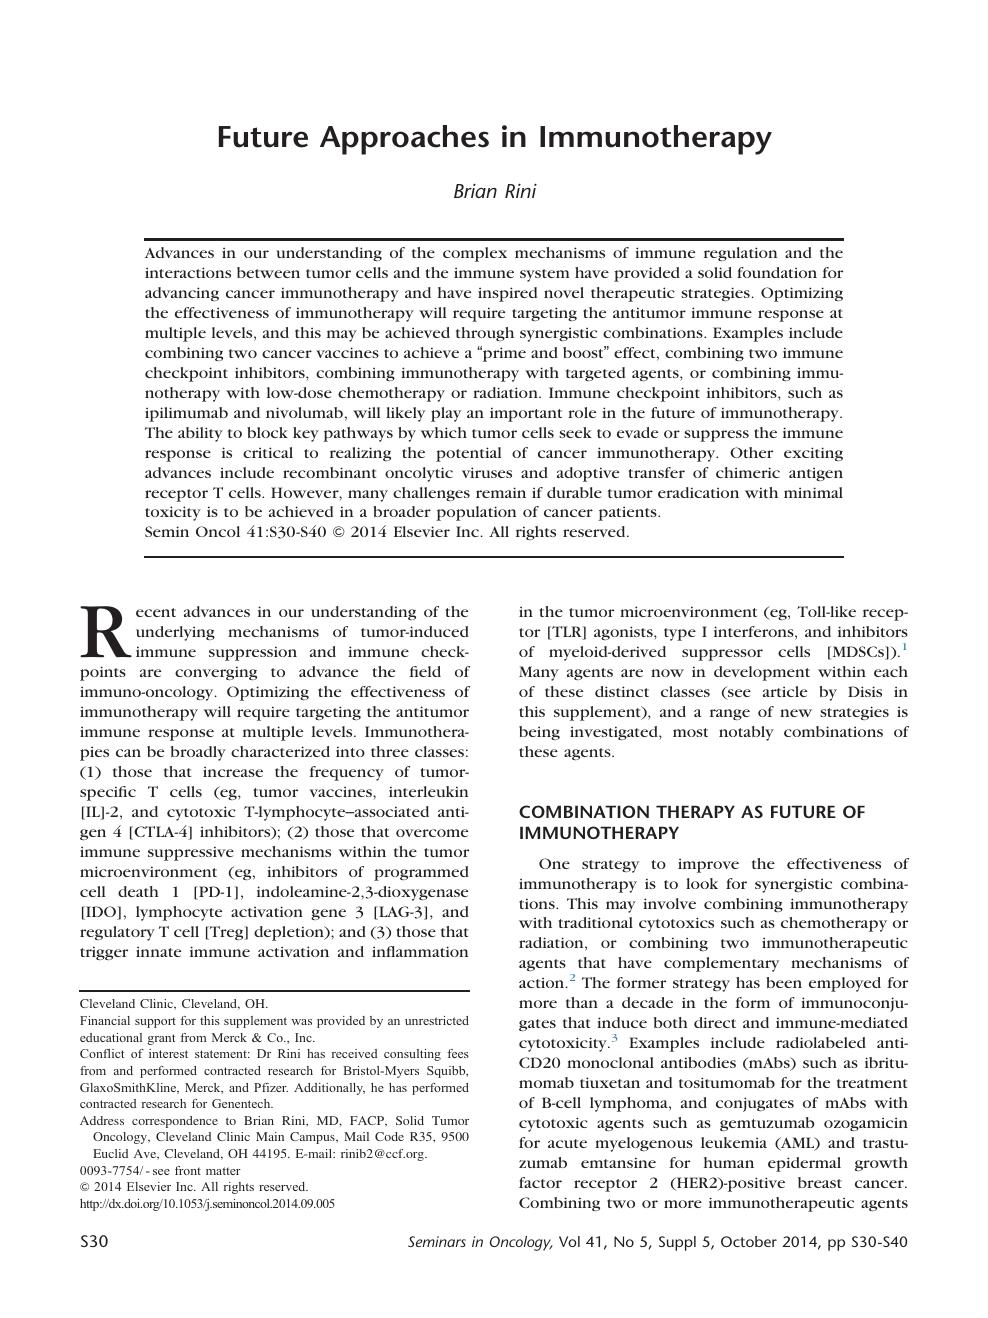 research paper eg